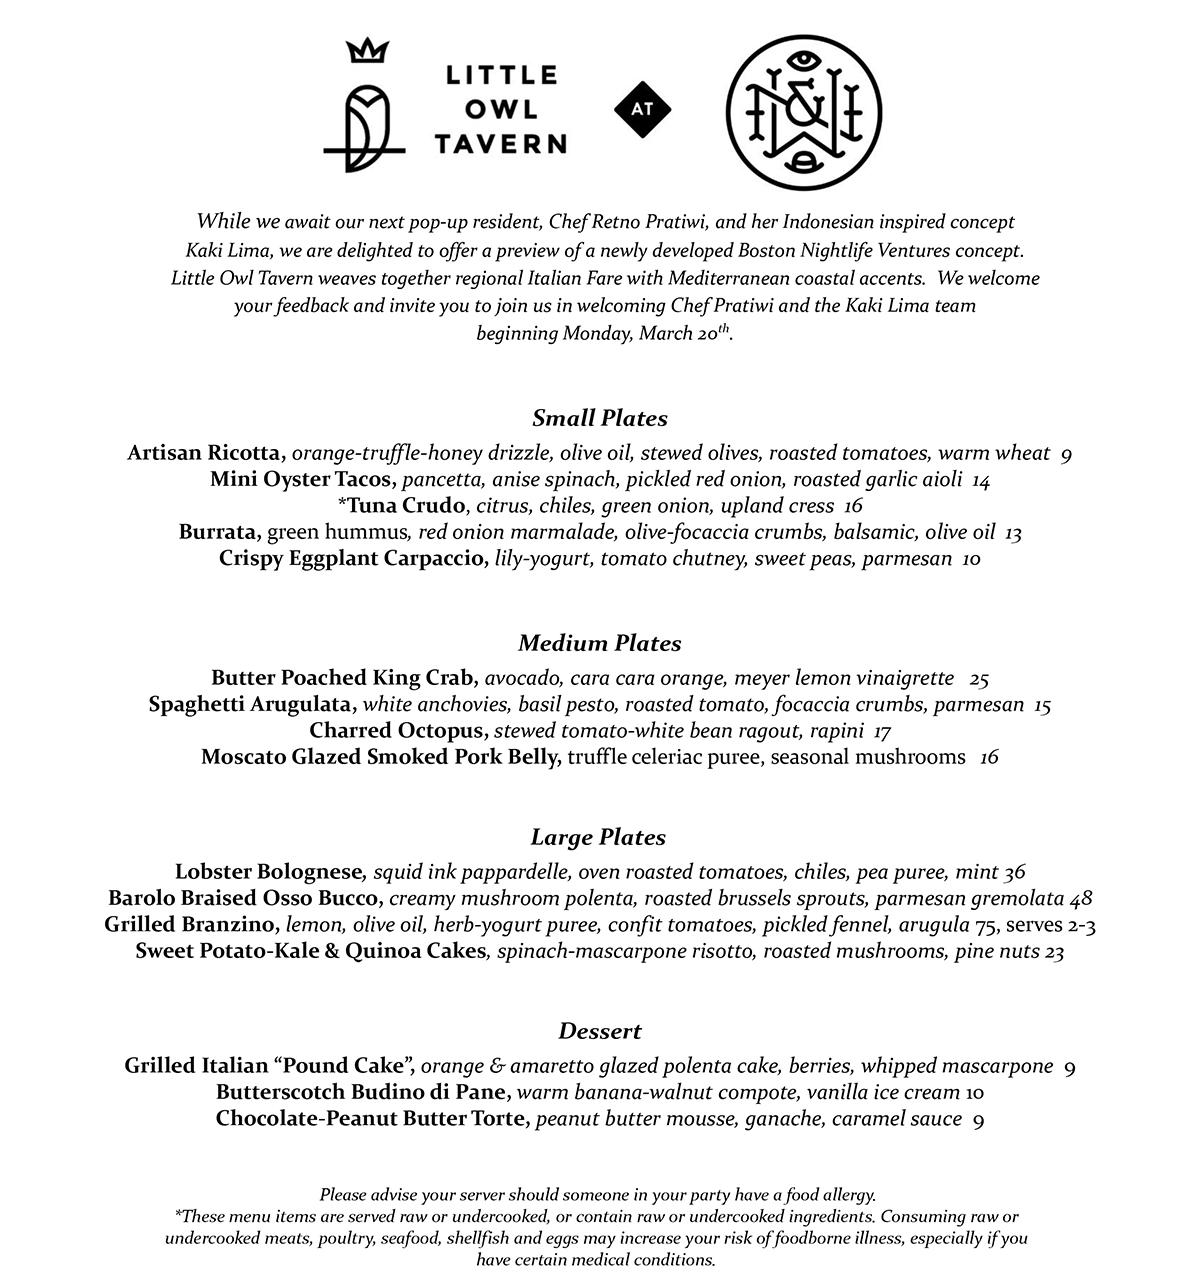 Little Owl Tavern menu at Wink and Nod_1.23.17